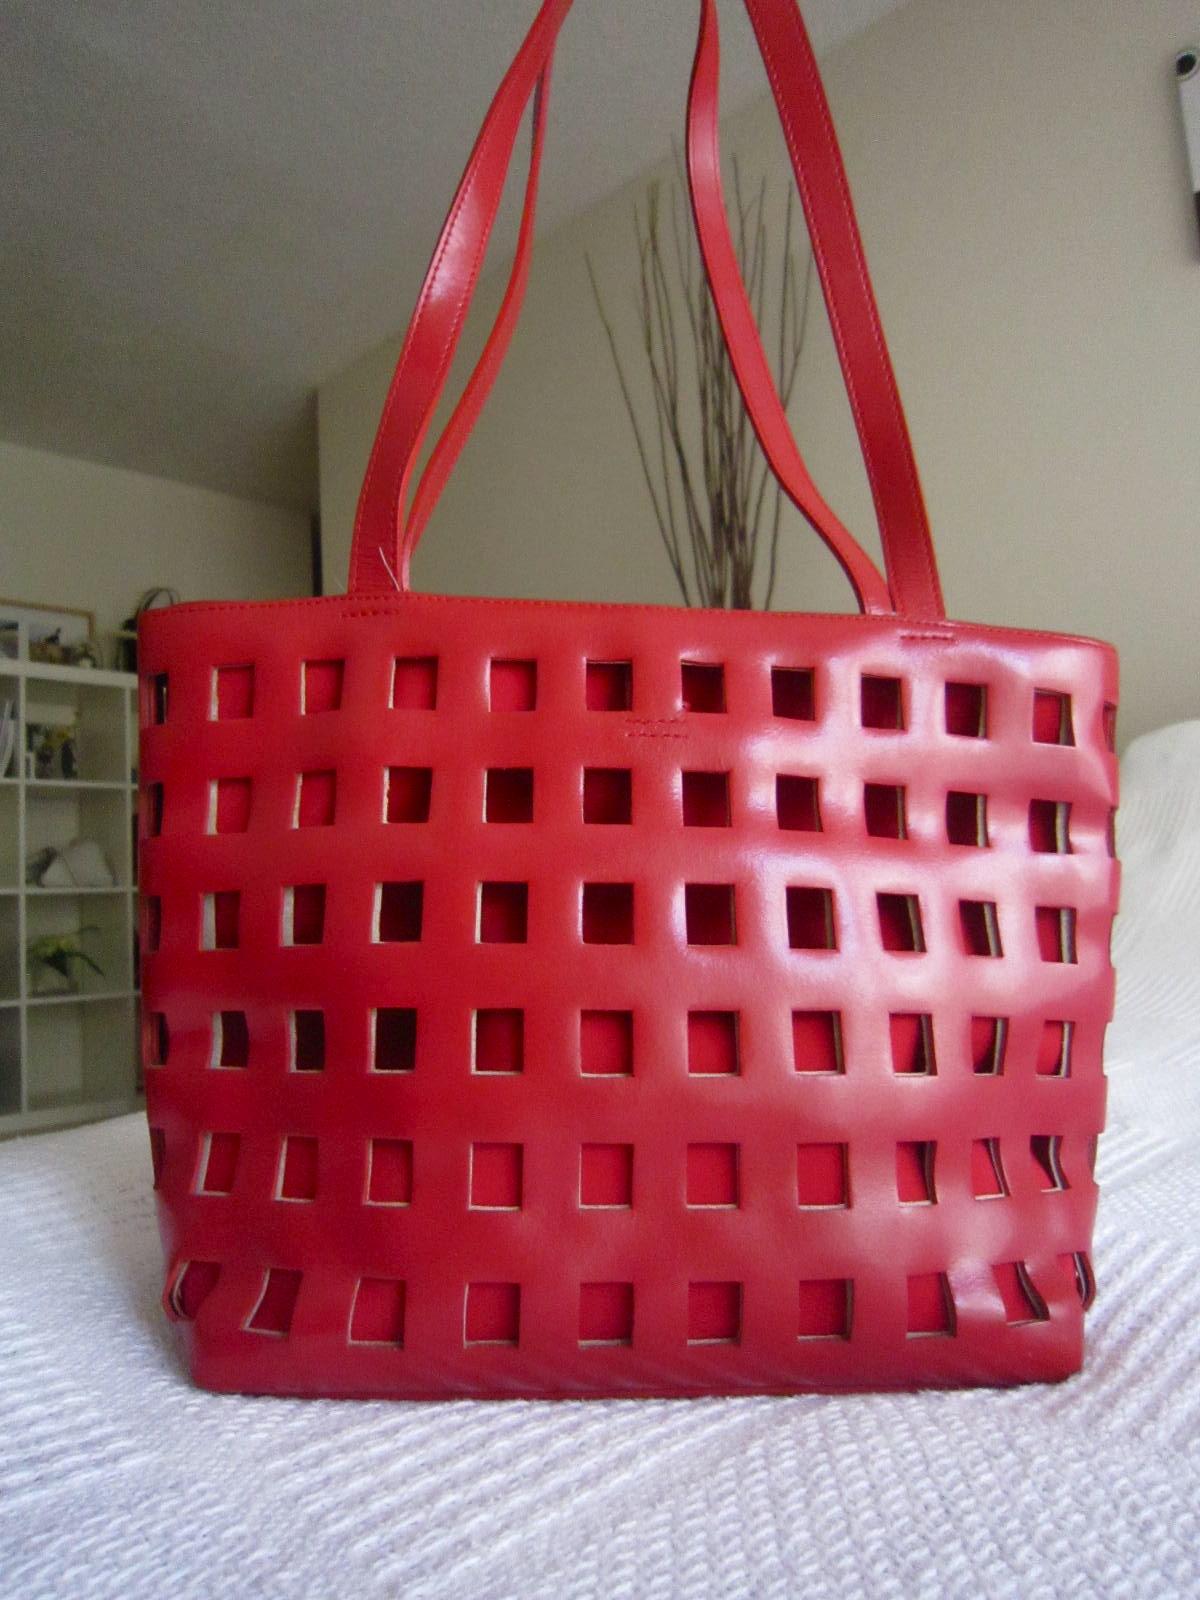 2a5404734638 Holt Renfrew Red Cage Tote - Luxurylana Boutique